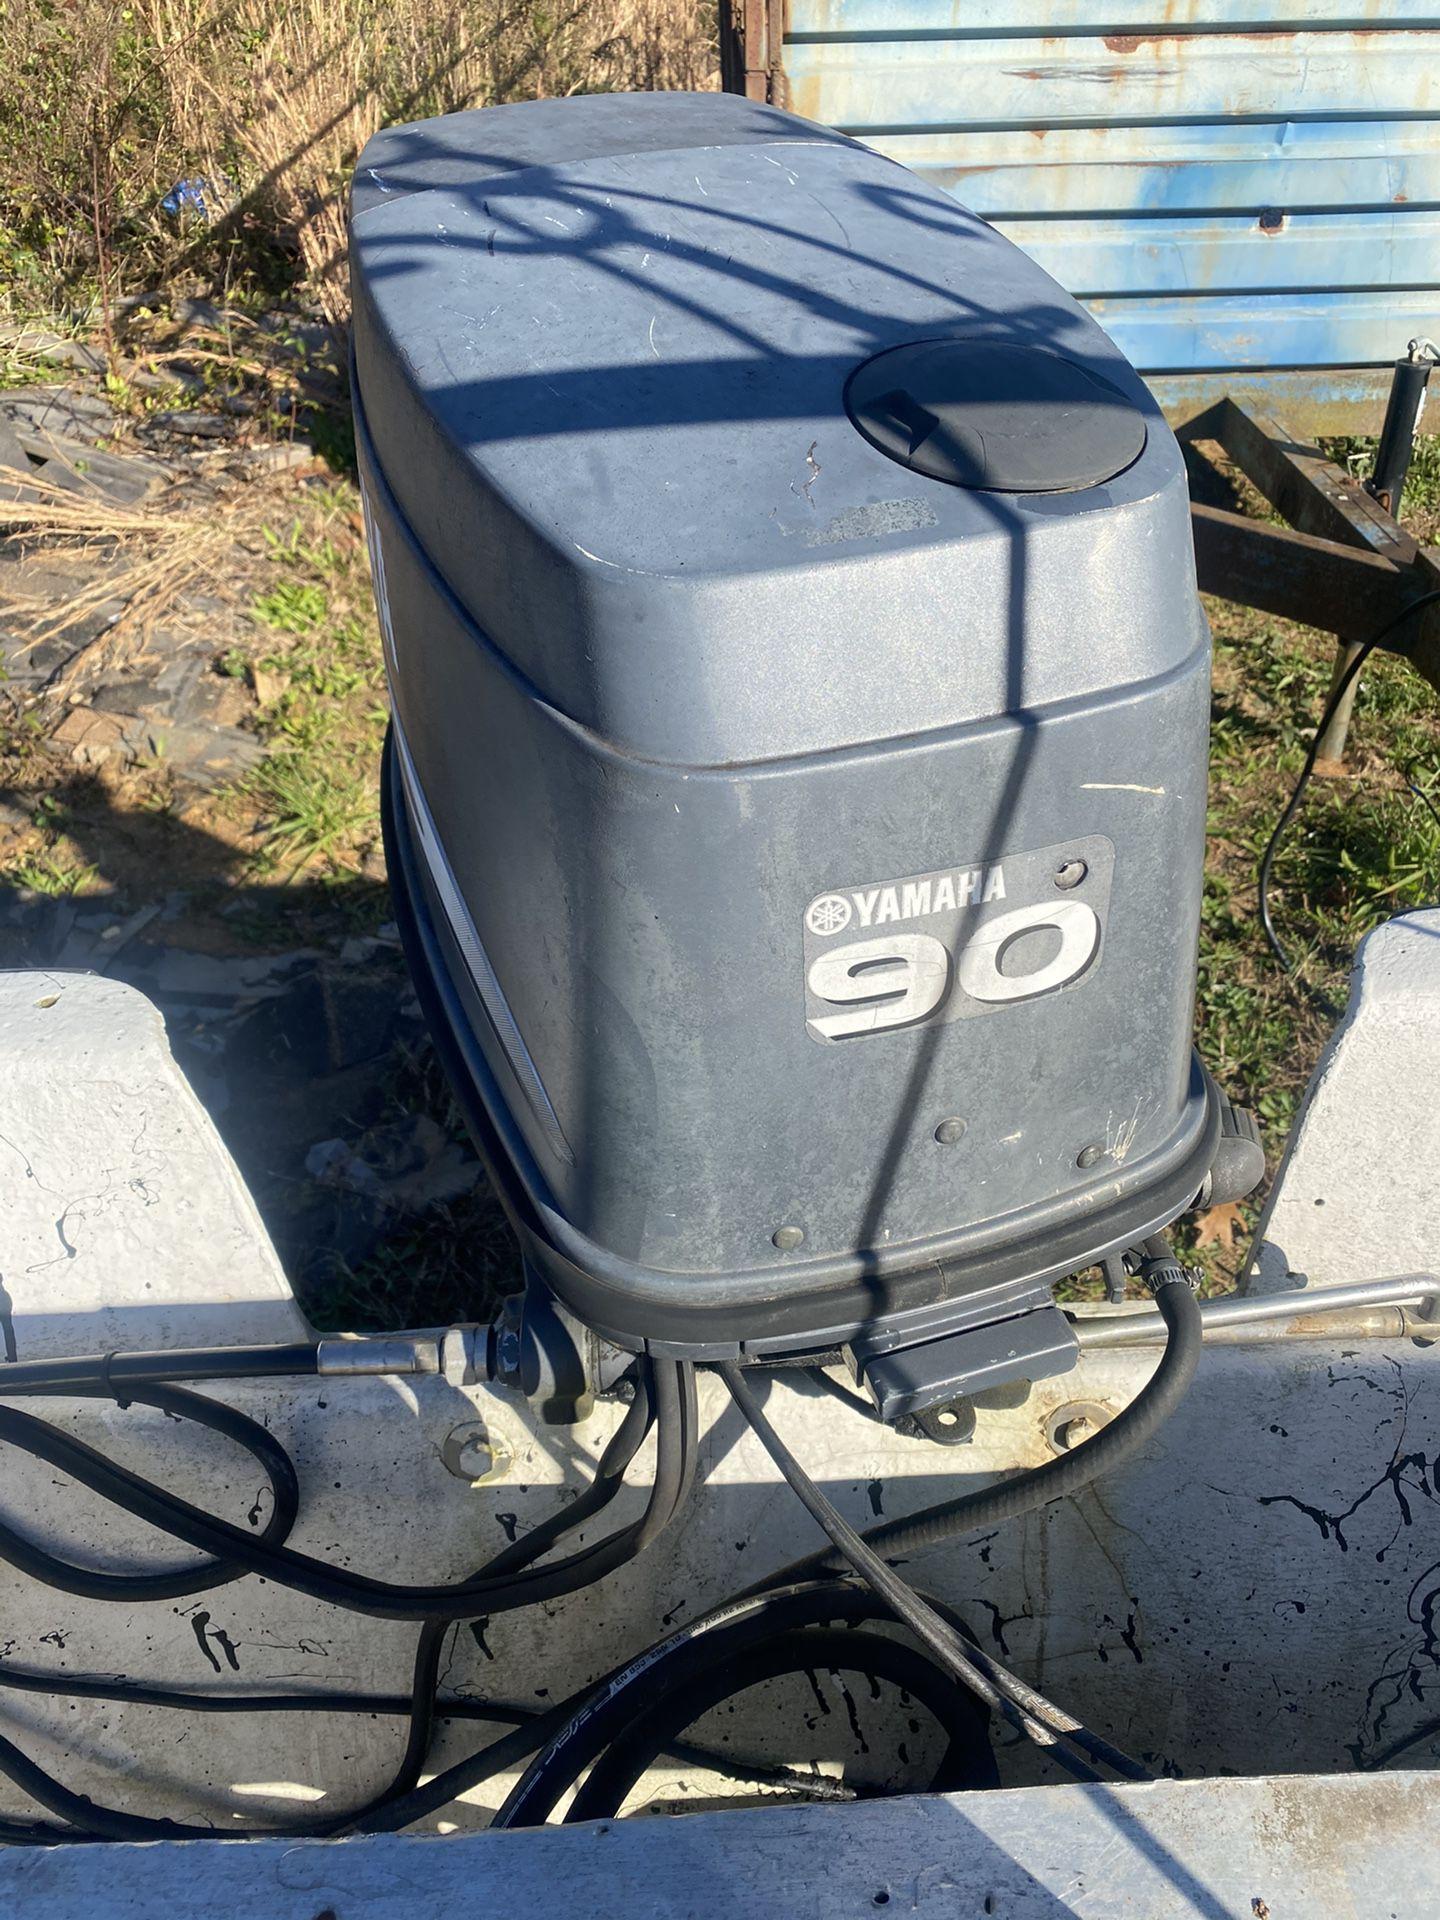 90 hp Yamaha outboard motor